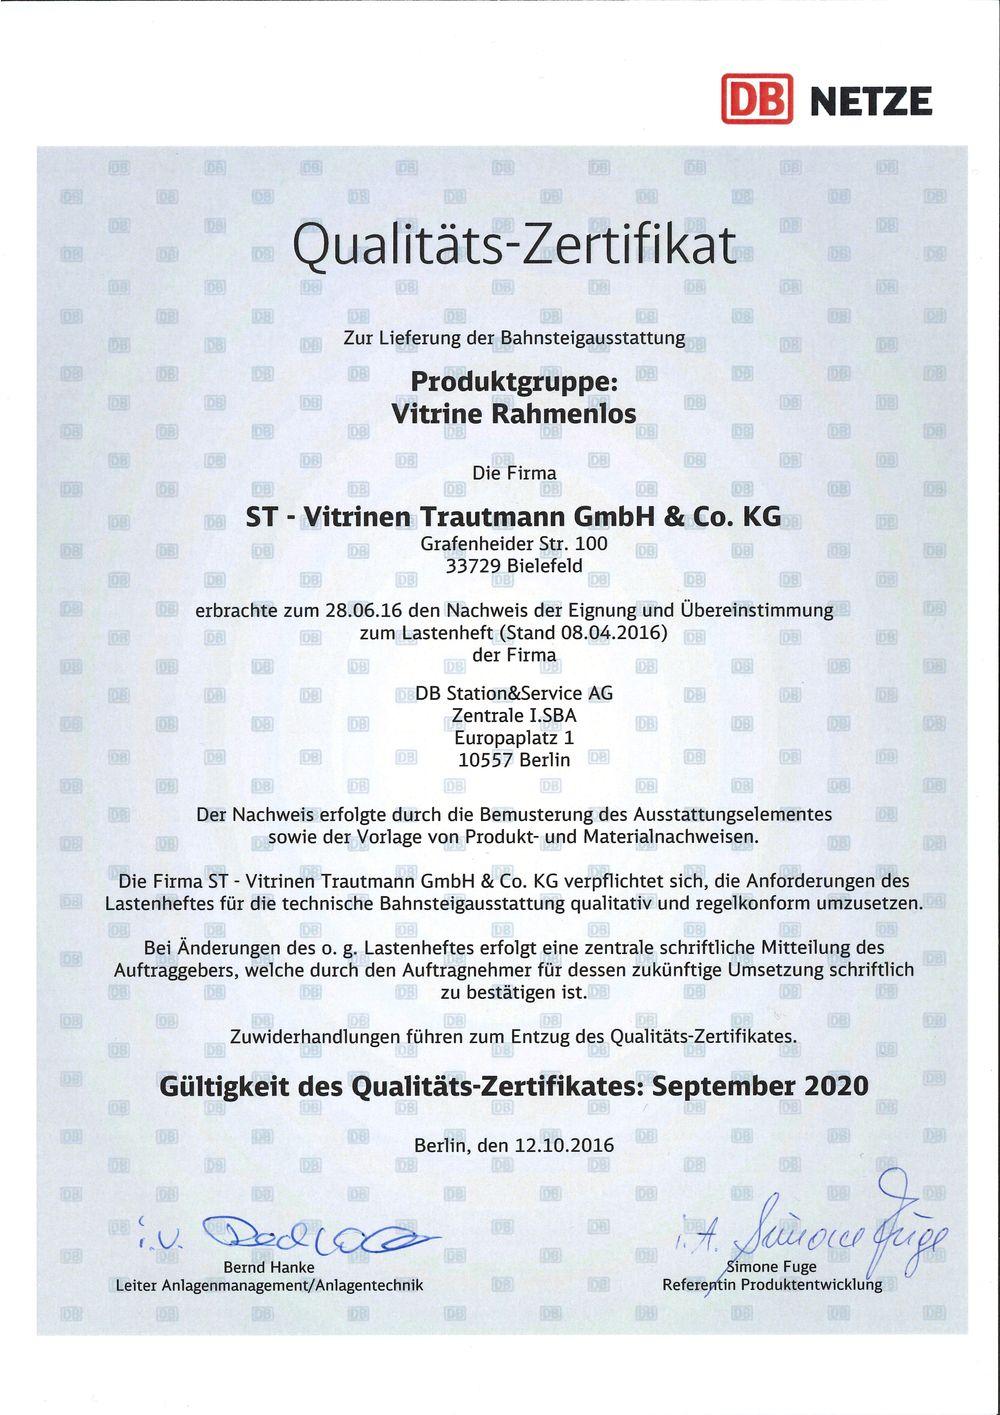 Erfreut Zertifikat Der Dankeschablone Ideen - Entry Level Resume ...